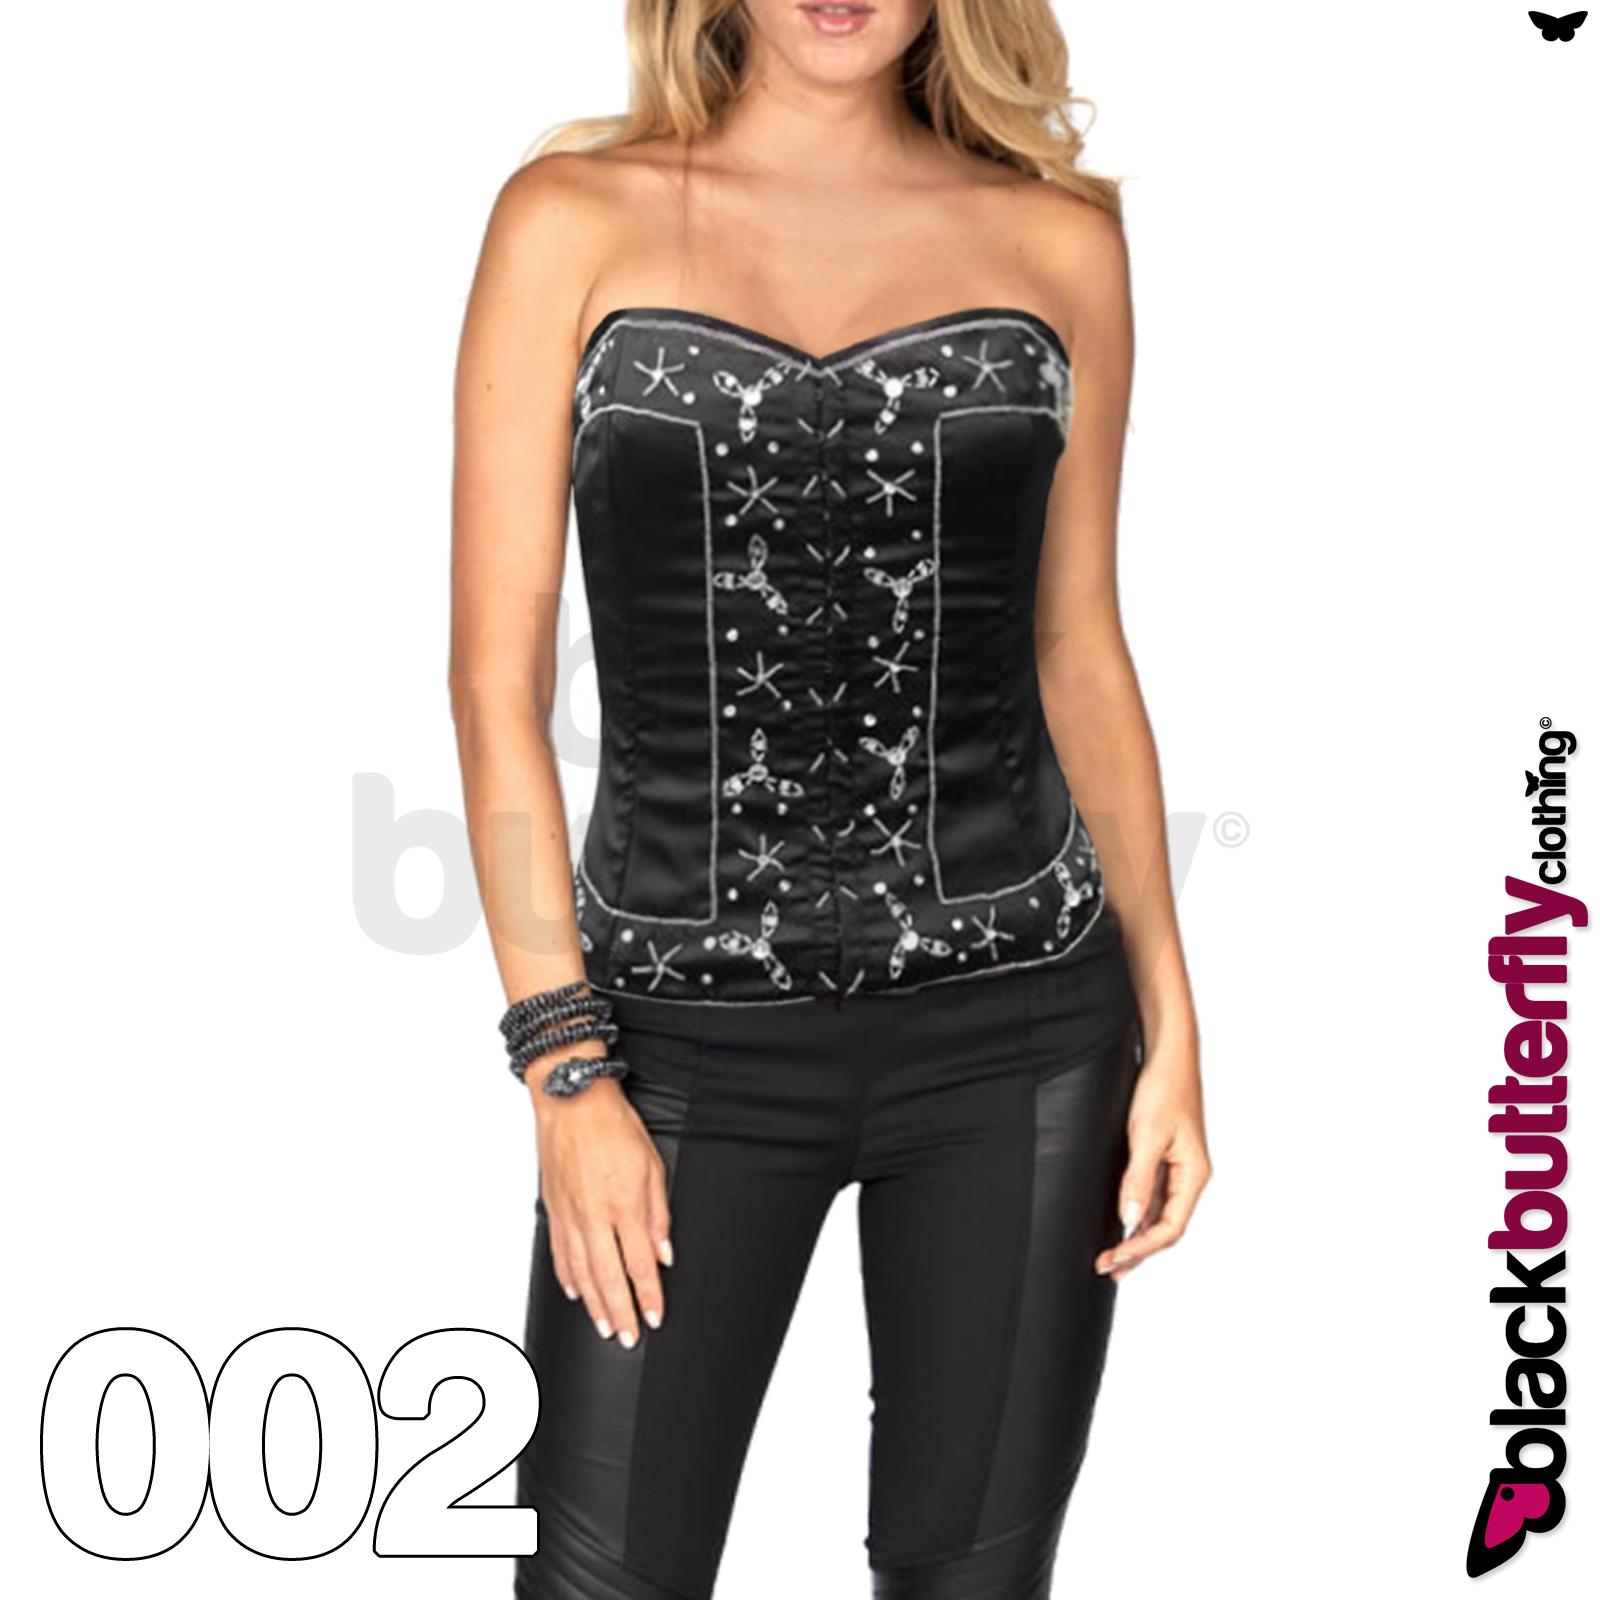 sexy tops corset jpg 422x640